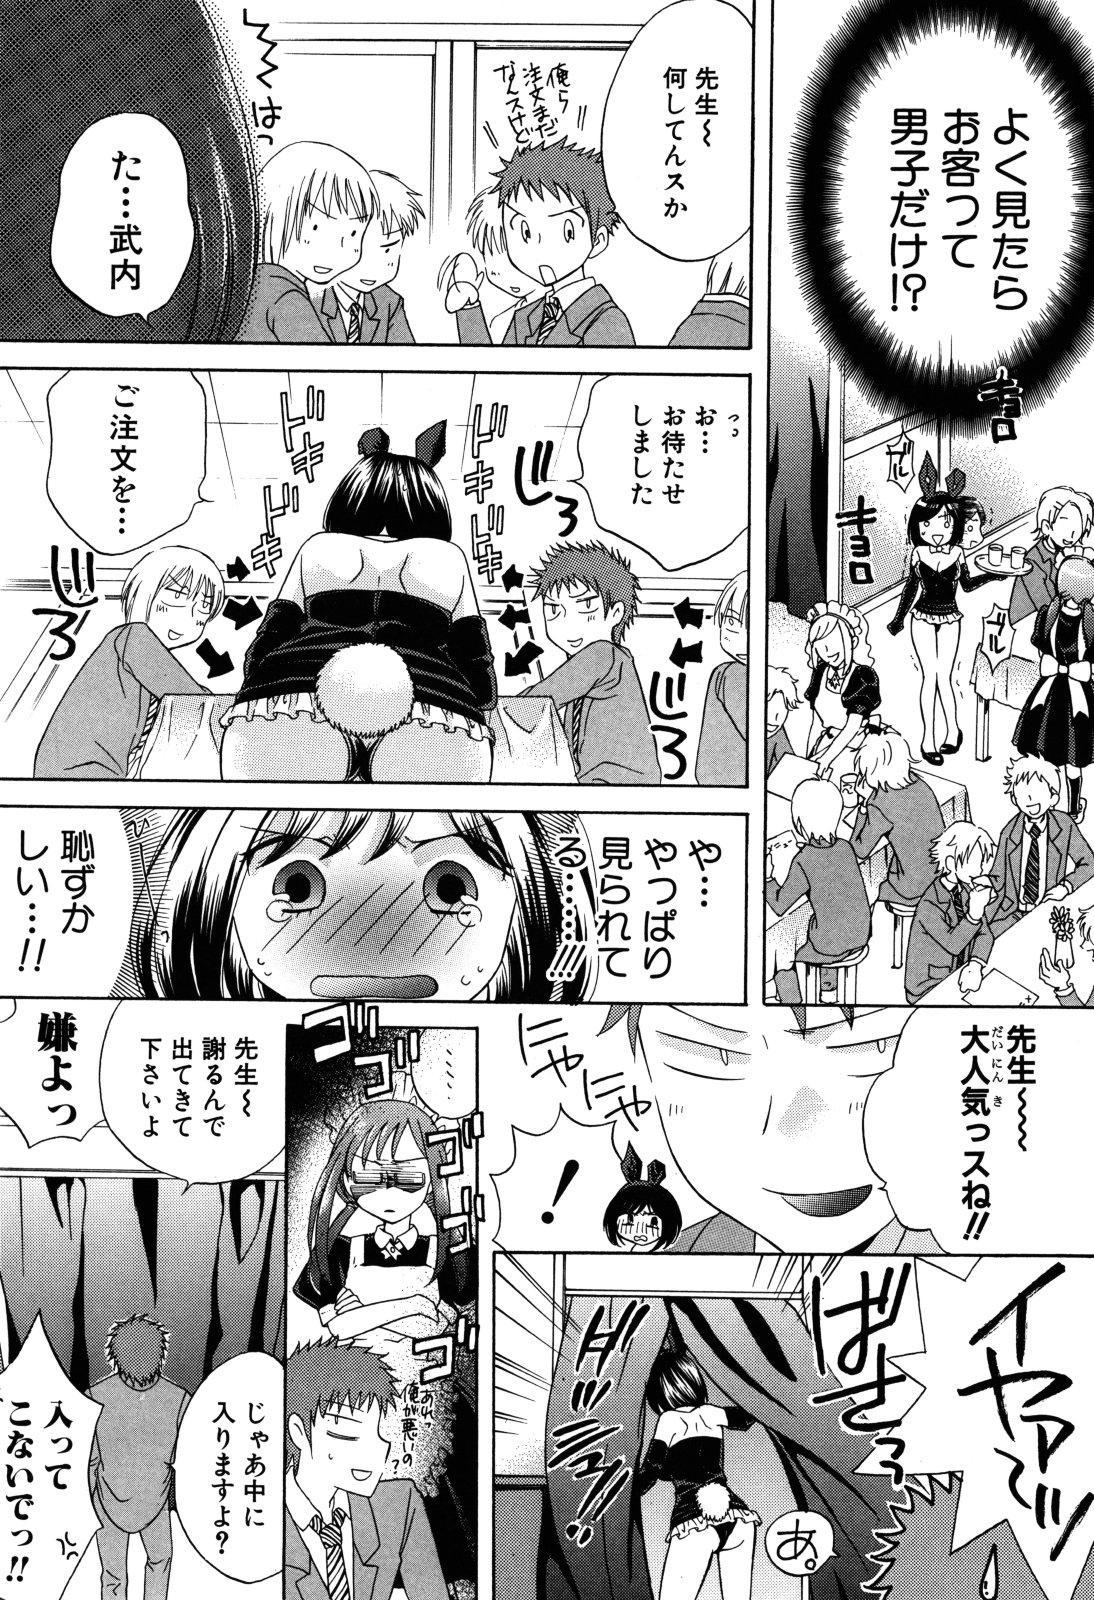 Kanojo ga Ochiru made - She in the depth 127